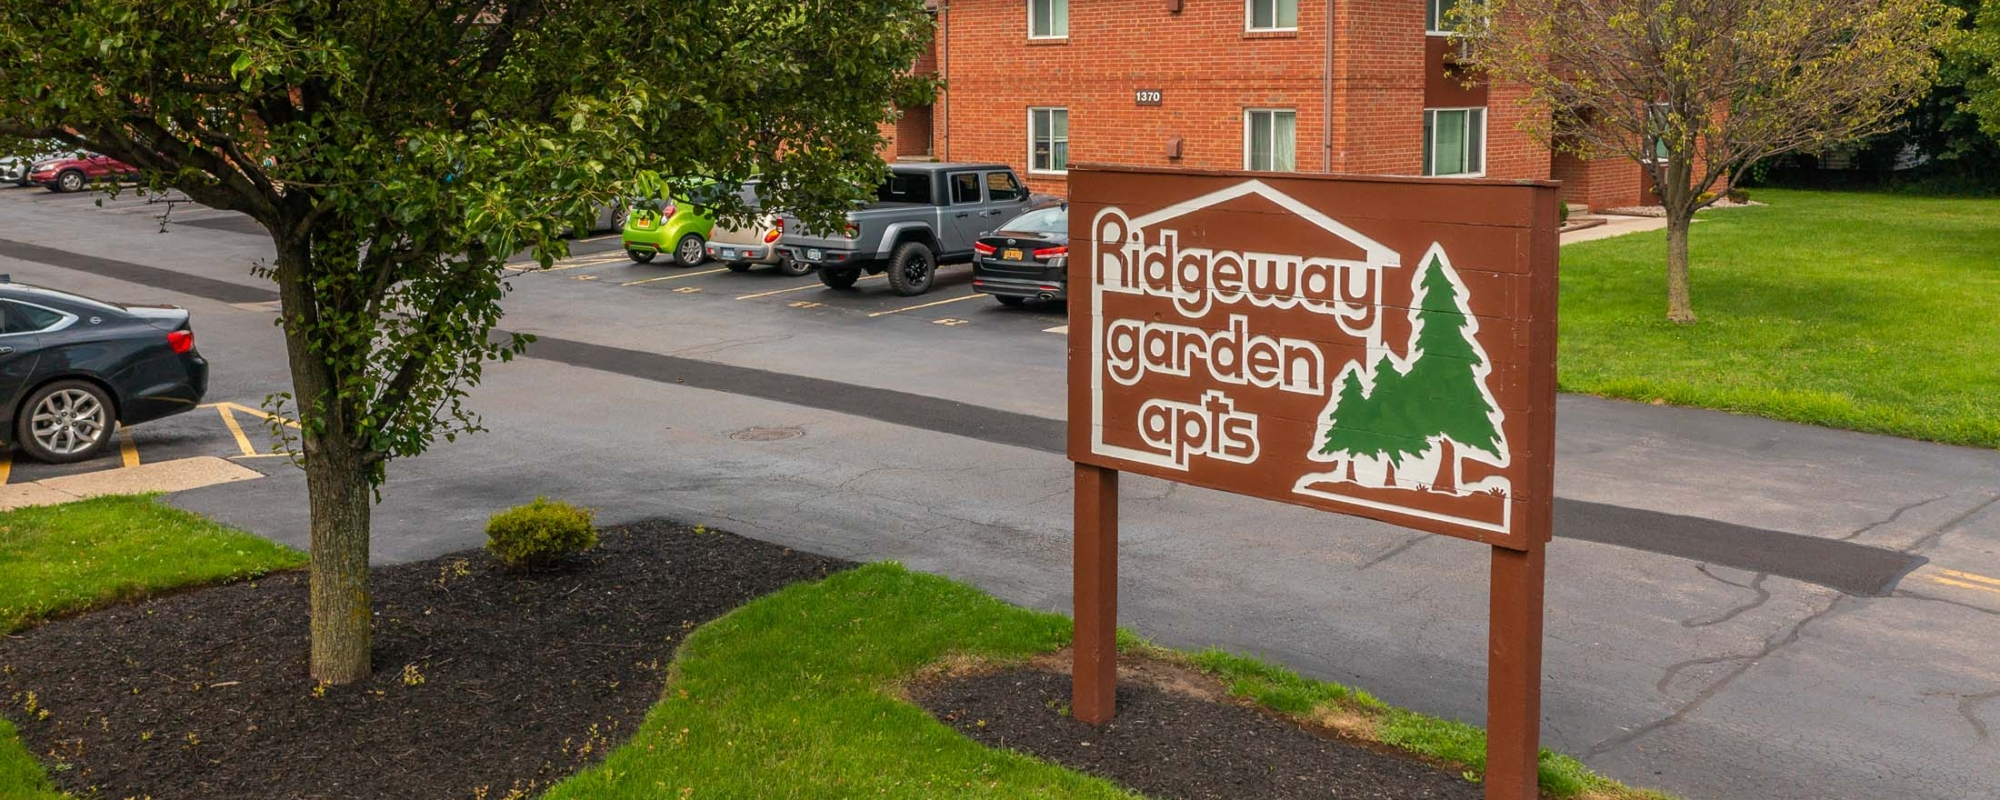 Welcome to Ridgeway Garden Apartments